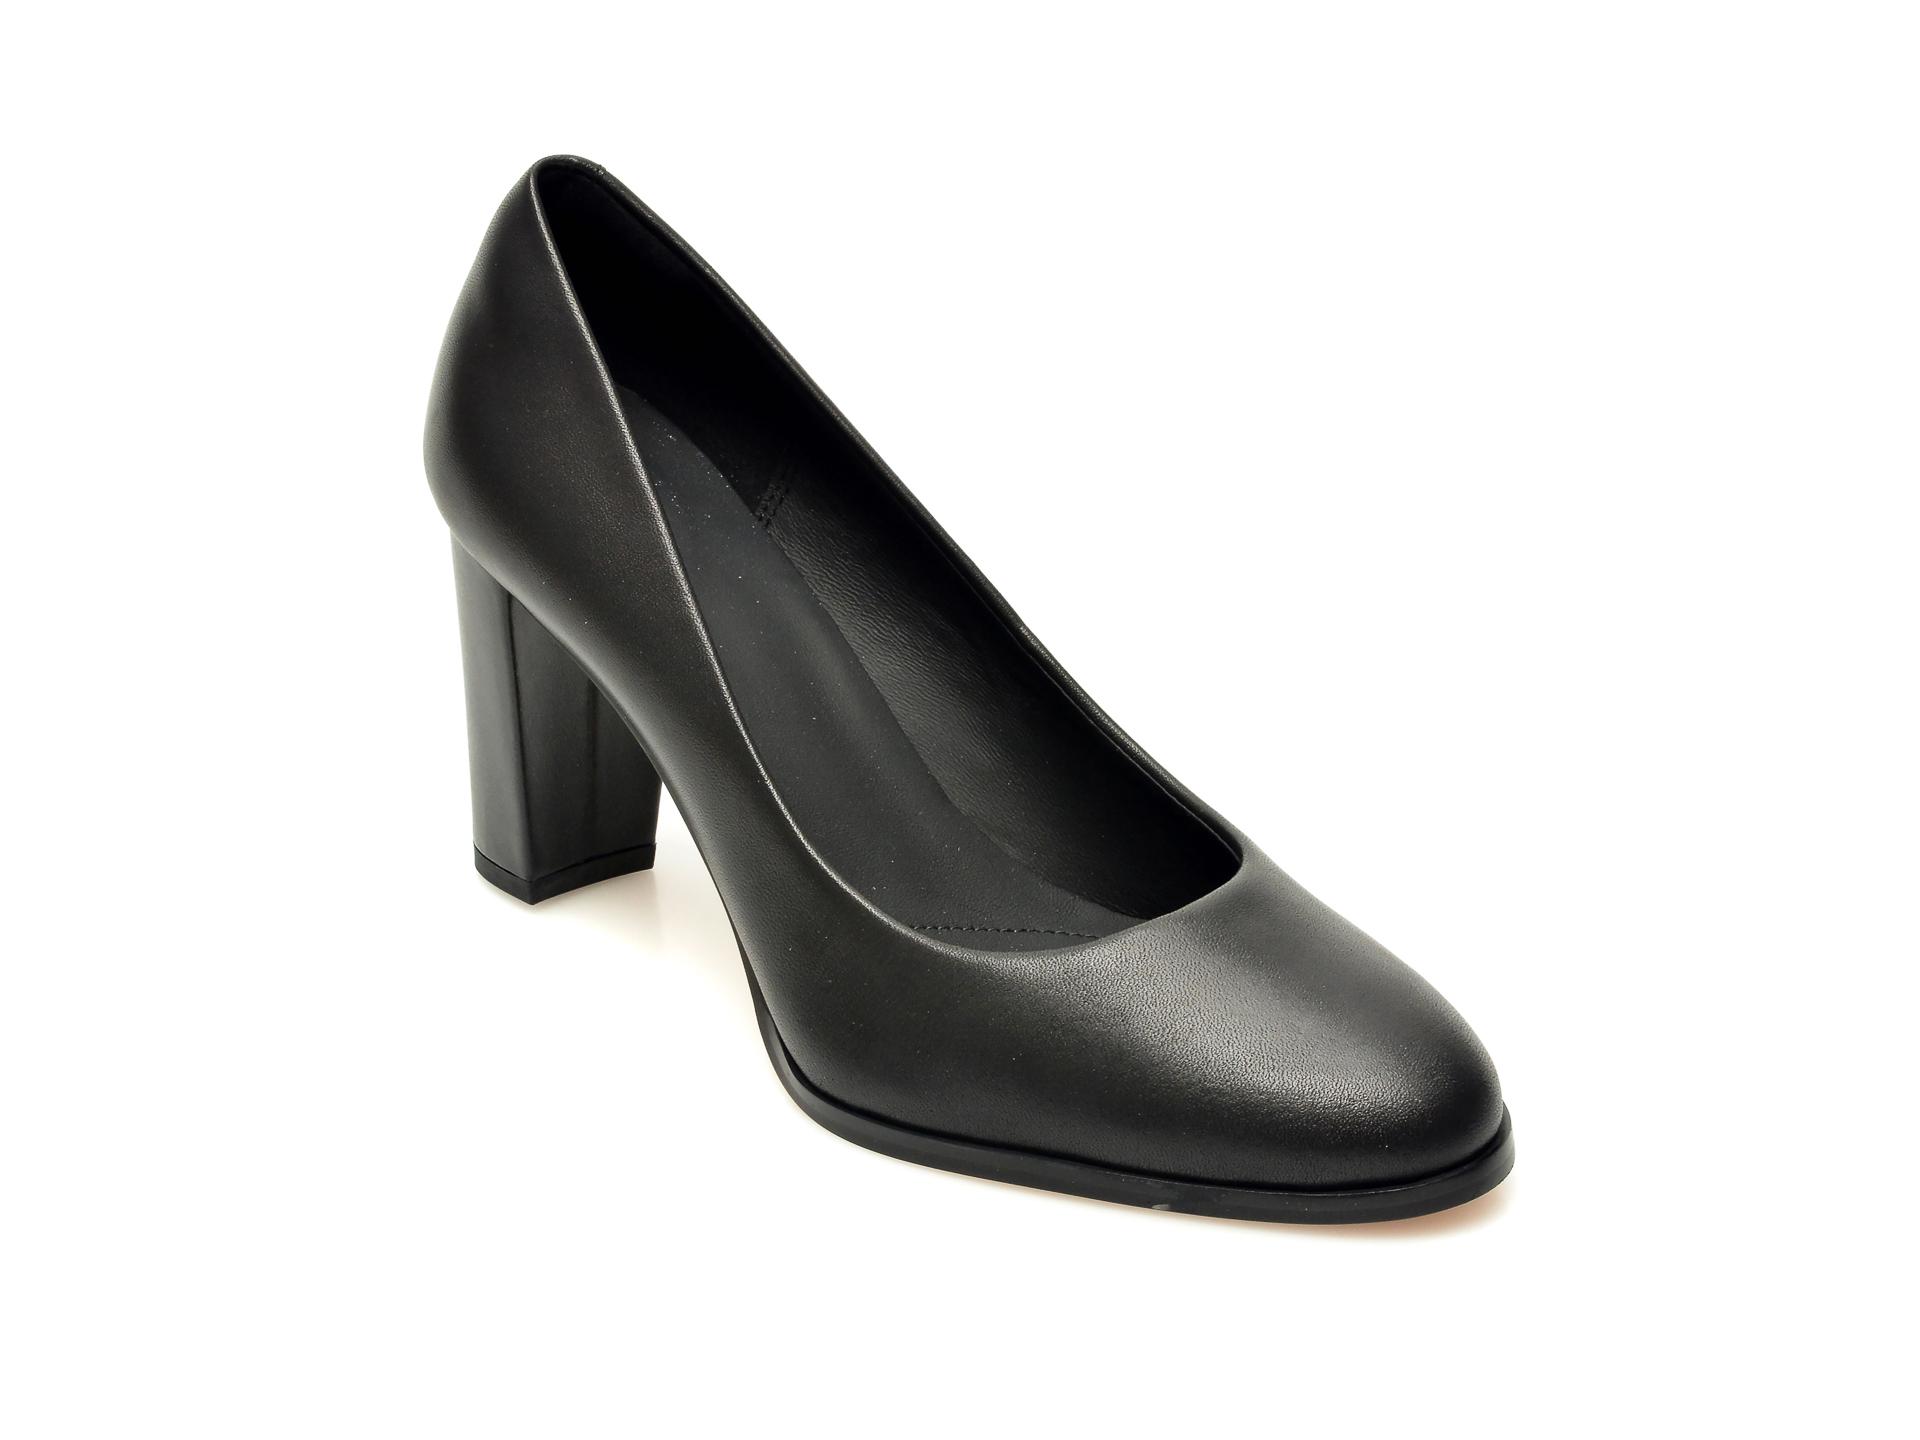 Pantofi CLARKS negri, SHEER ROSE, din piele naturala